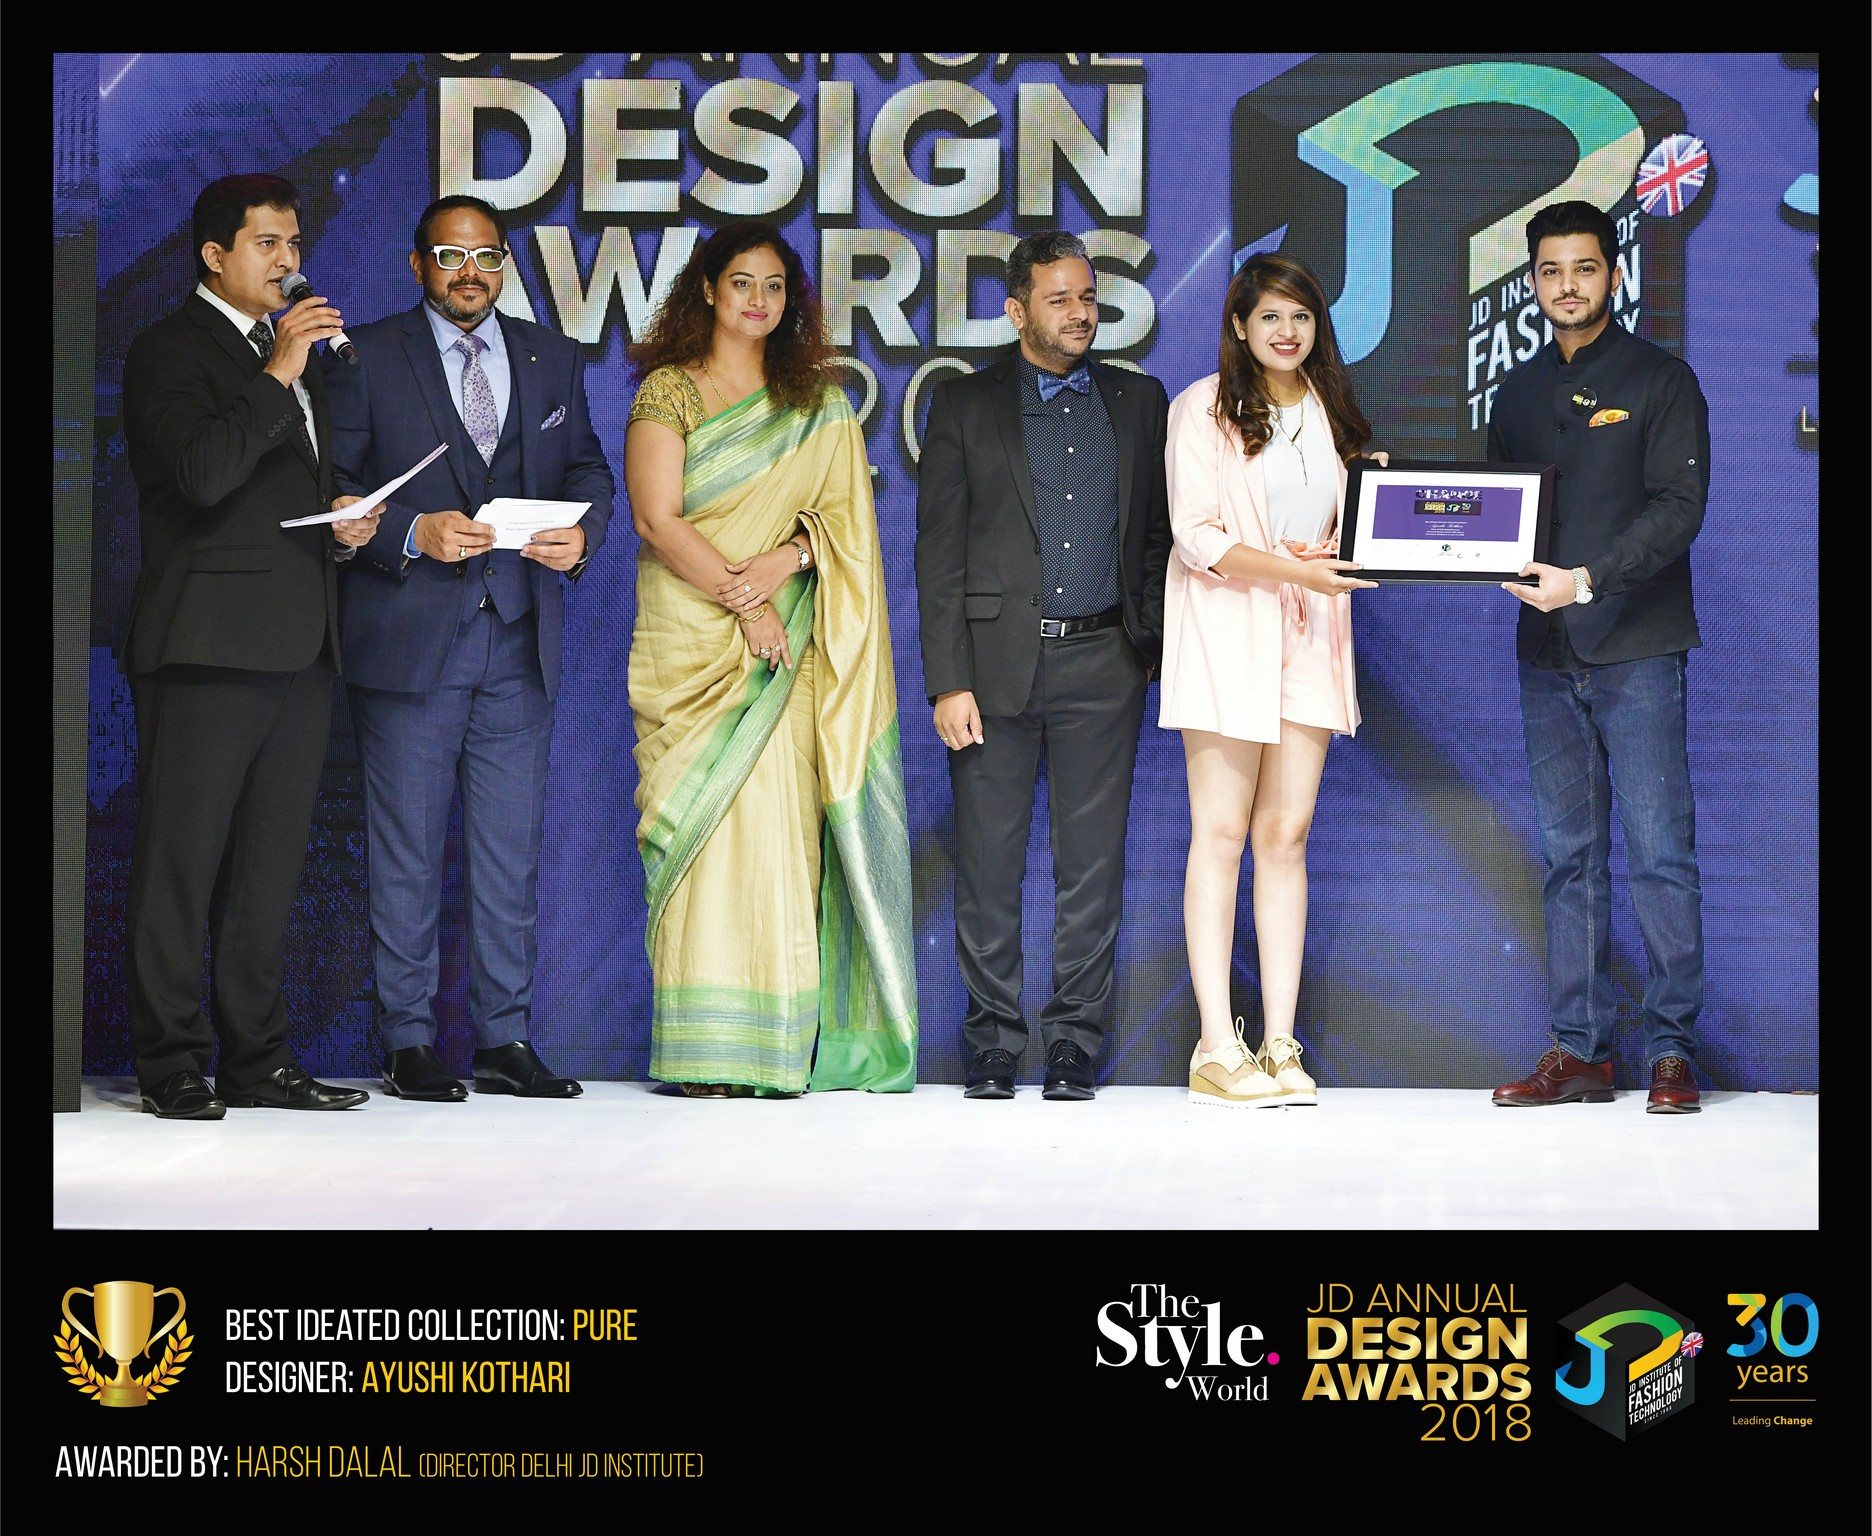 Pure – Change – JD Annual Design Awards 2018 | Designer: Ayushi Kothari (ADFD 2015 Batch) | Photography : Jerin Nath (@jerin_nath) pure - 3 - Pure – Change – JD Annual Design Awards 2018